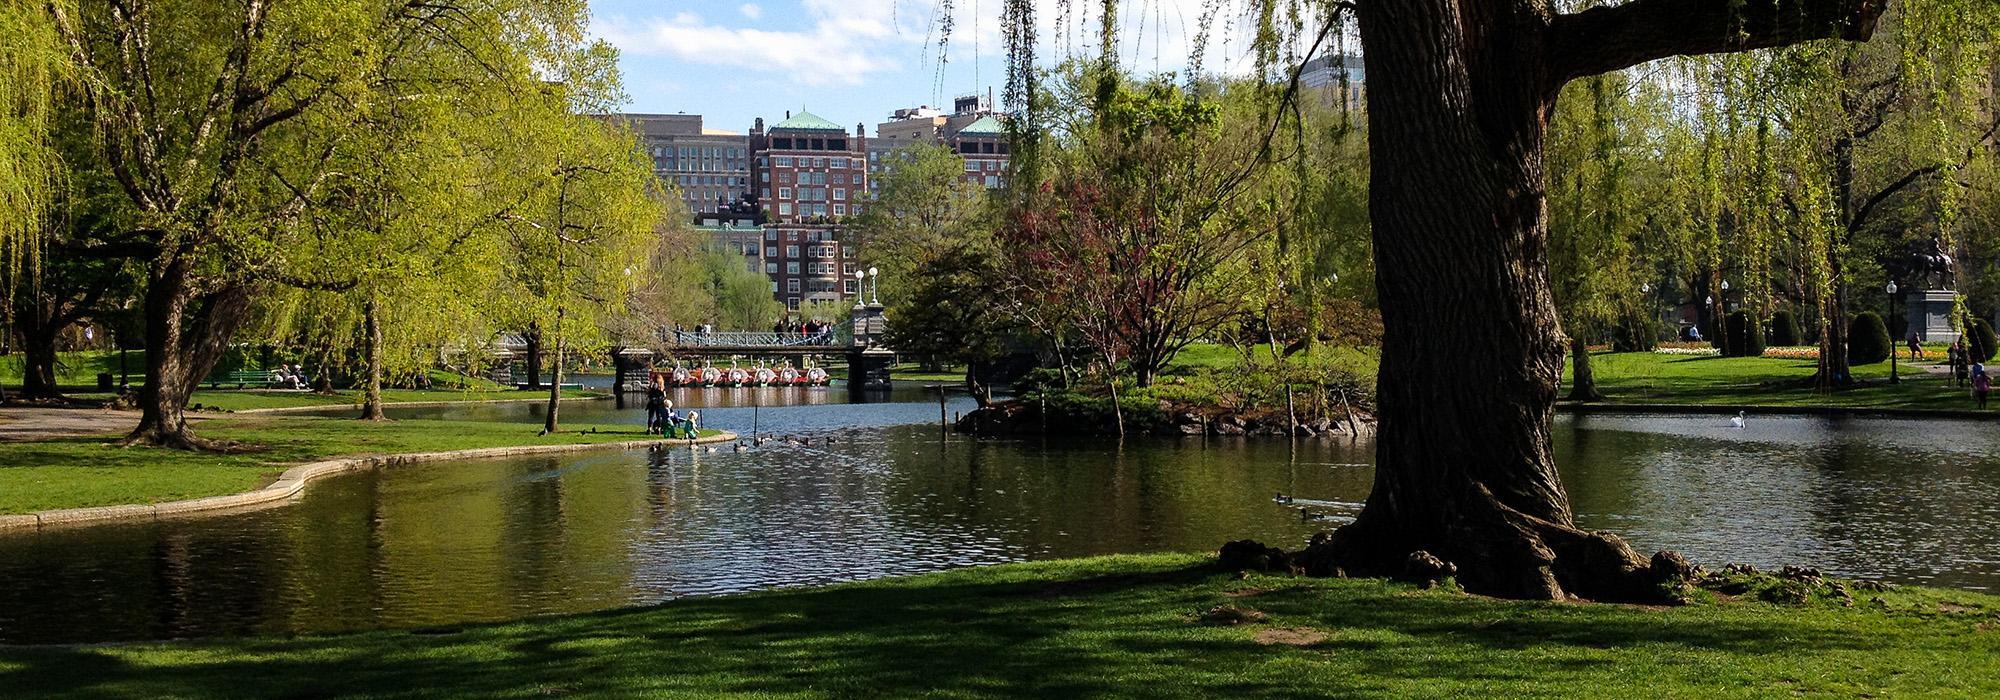 MA_Boston_PublicGarden_03_CharlesABirnbaum_2017.jpg